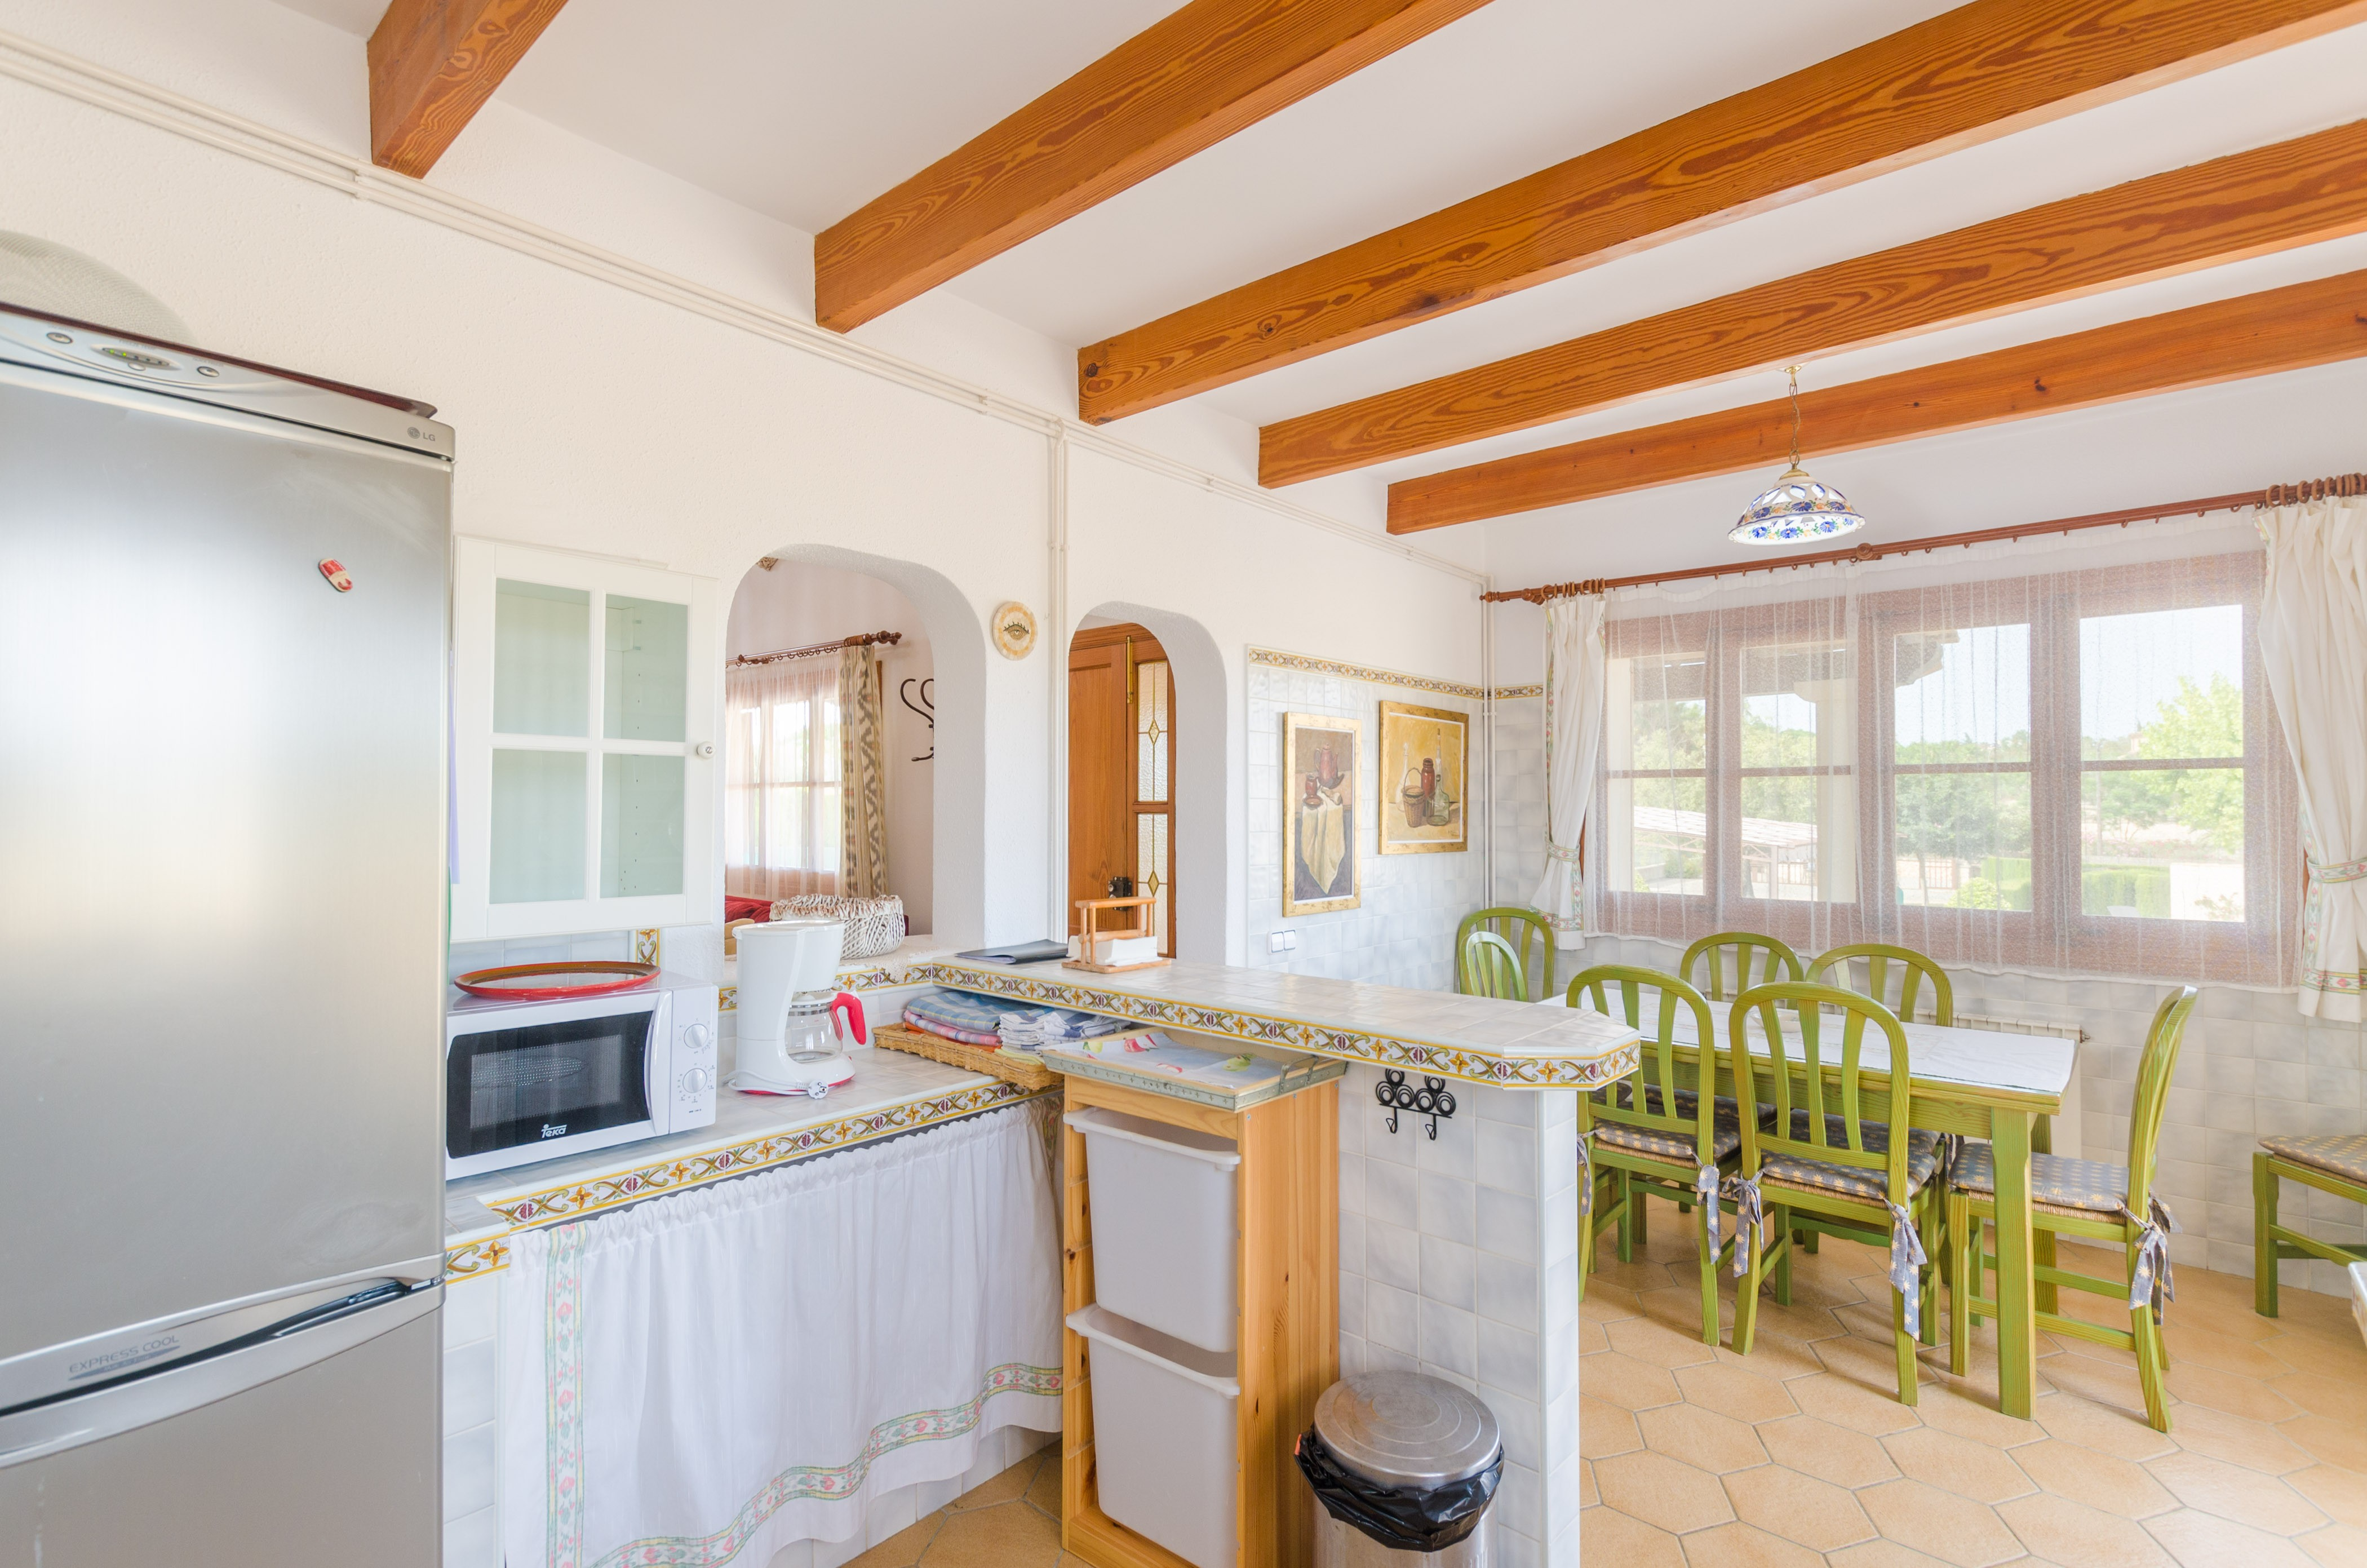 Maison de vacances SA SINIA (2374876), Lloret de Vistalegre, Majorque, Iles Baléares, Espagne, image 20